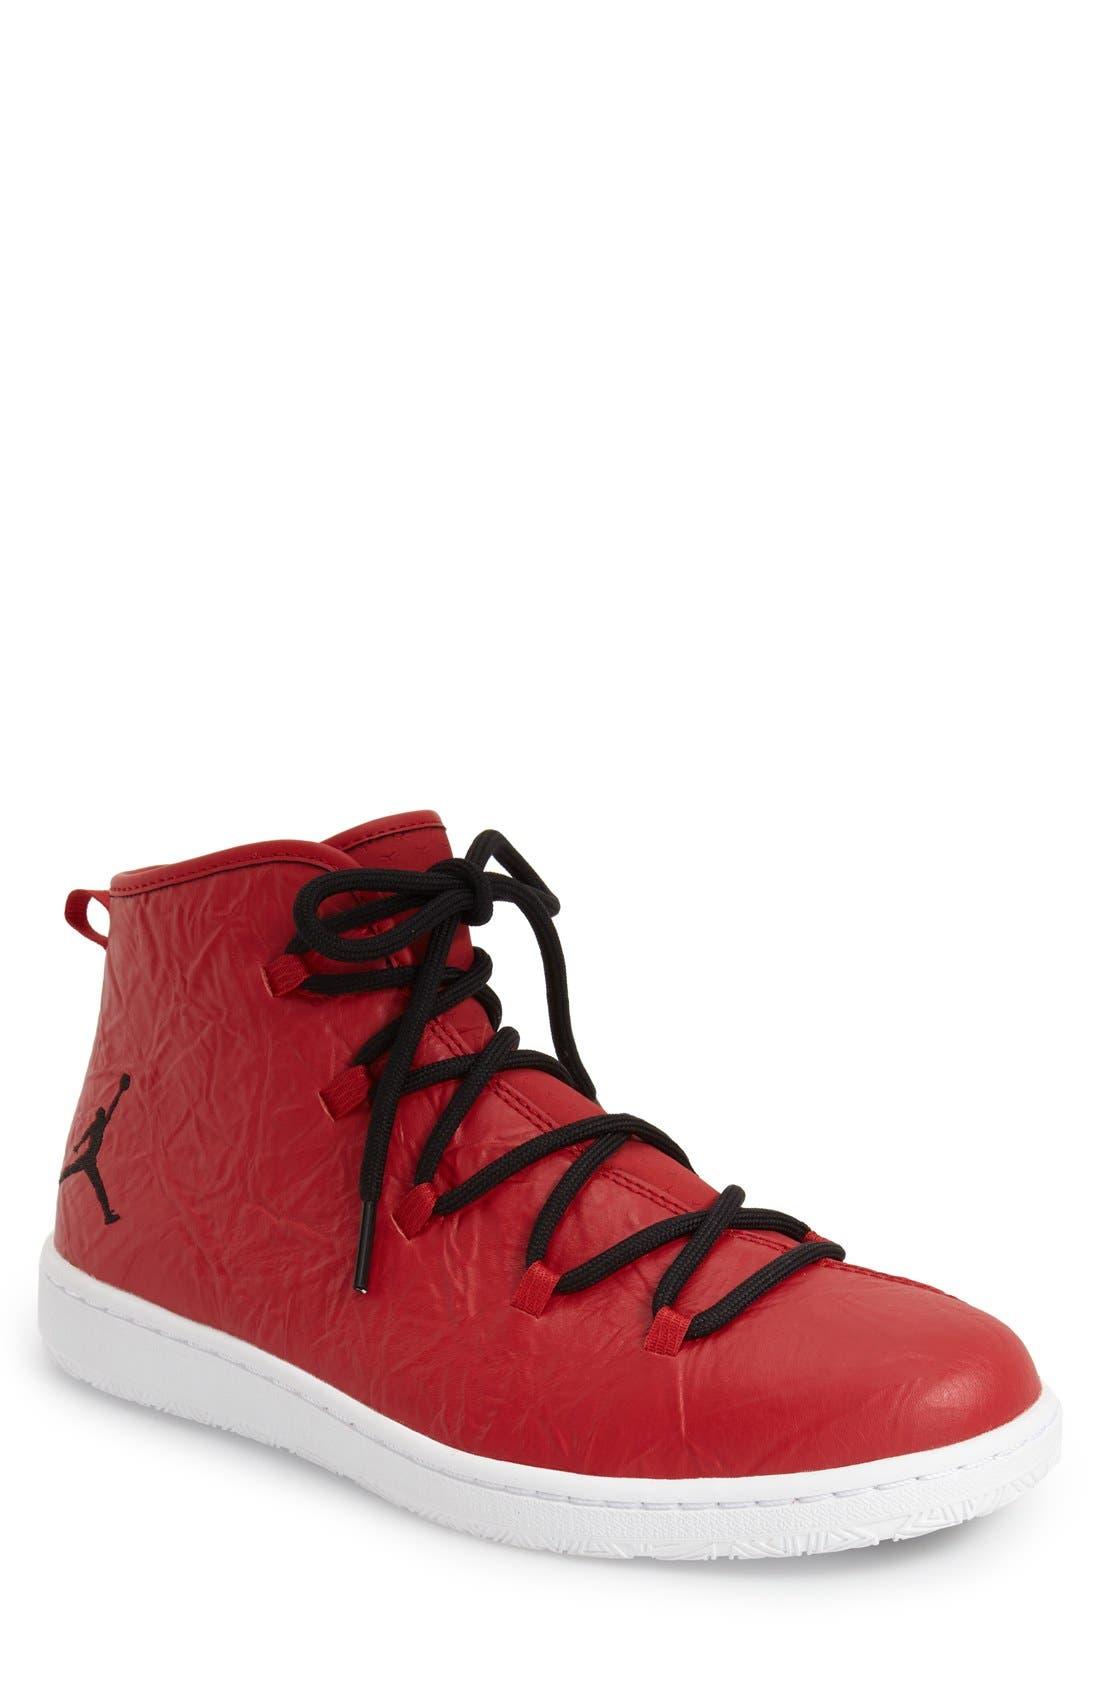 Main Image - Nike' Jordan Galaxy' Sneaker (Men)